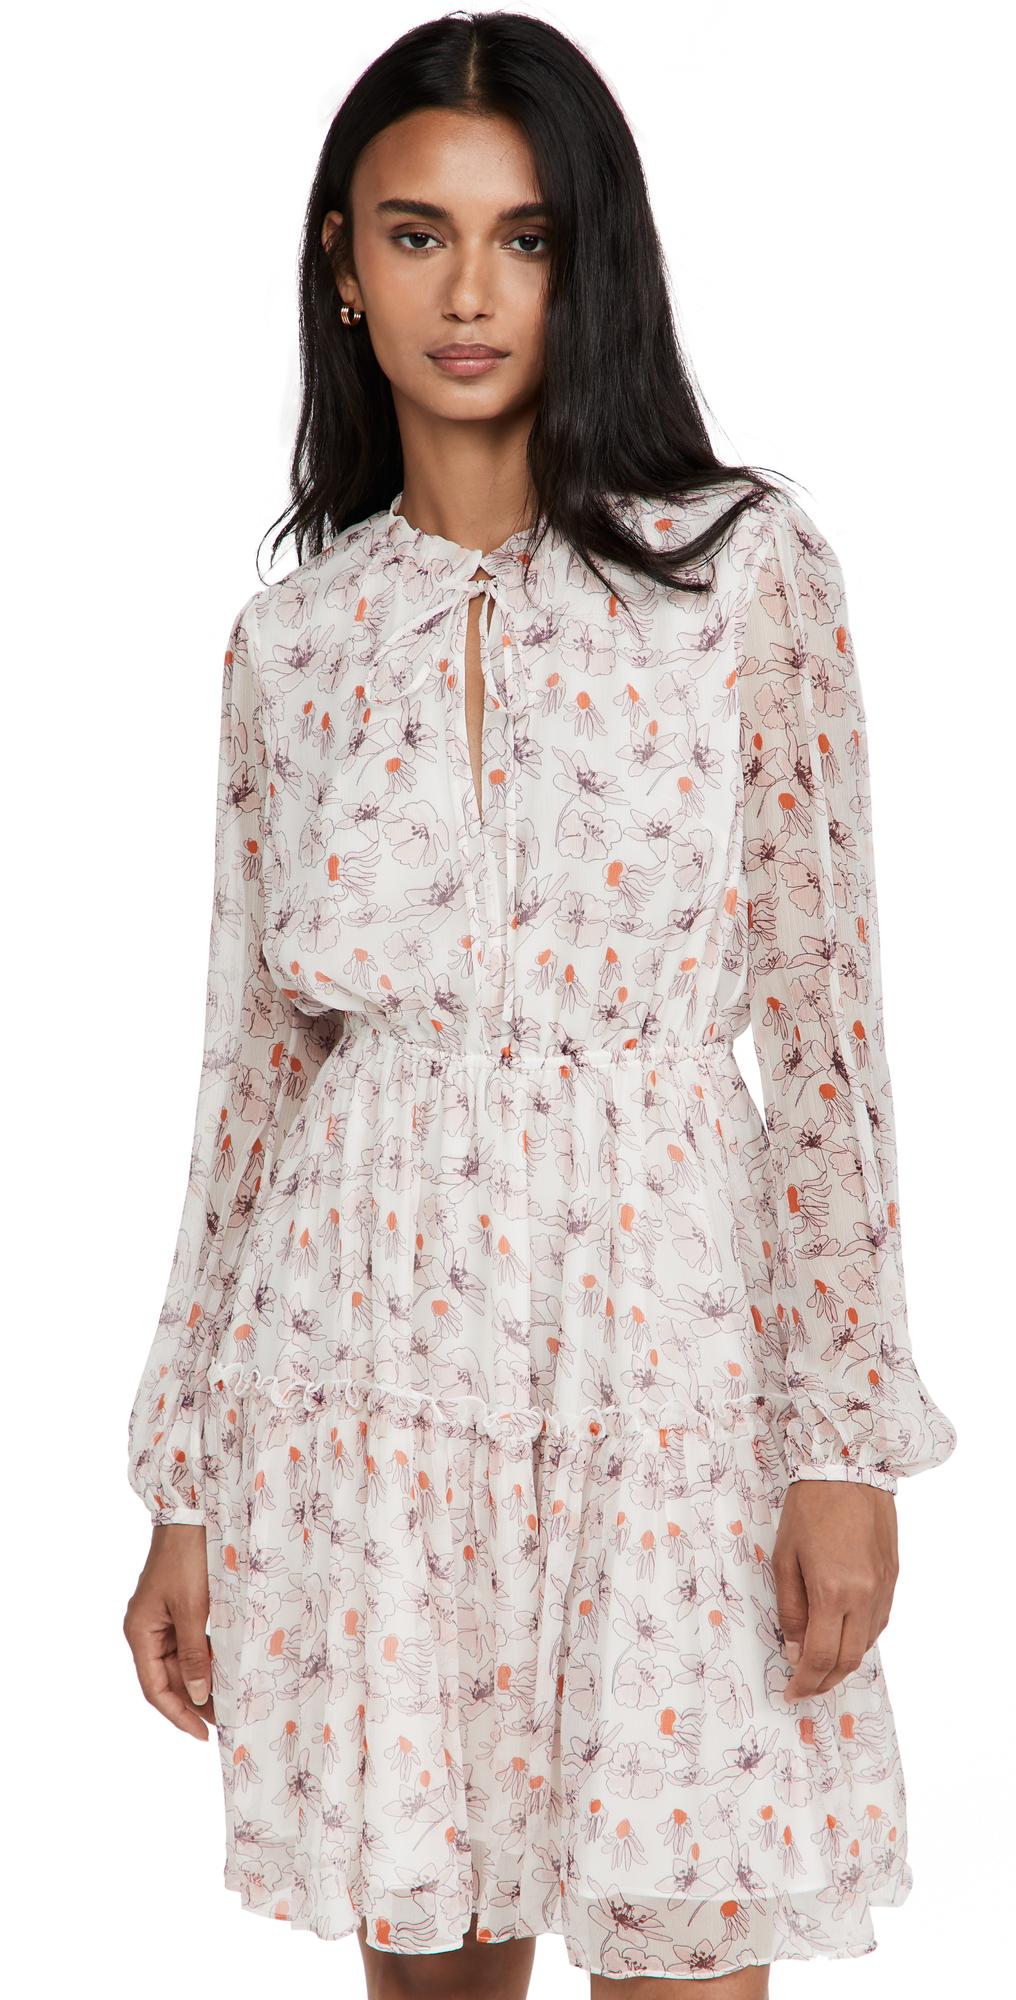 Jason Wu Printed Short Tiered Dress